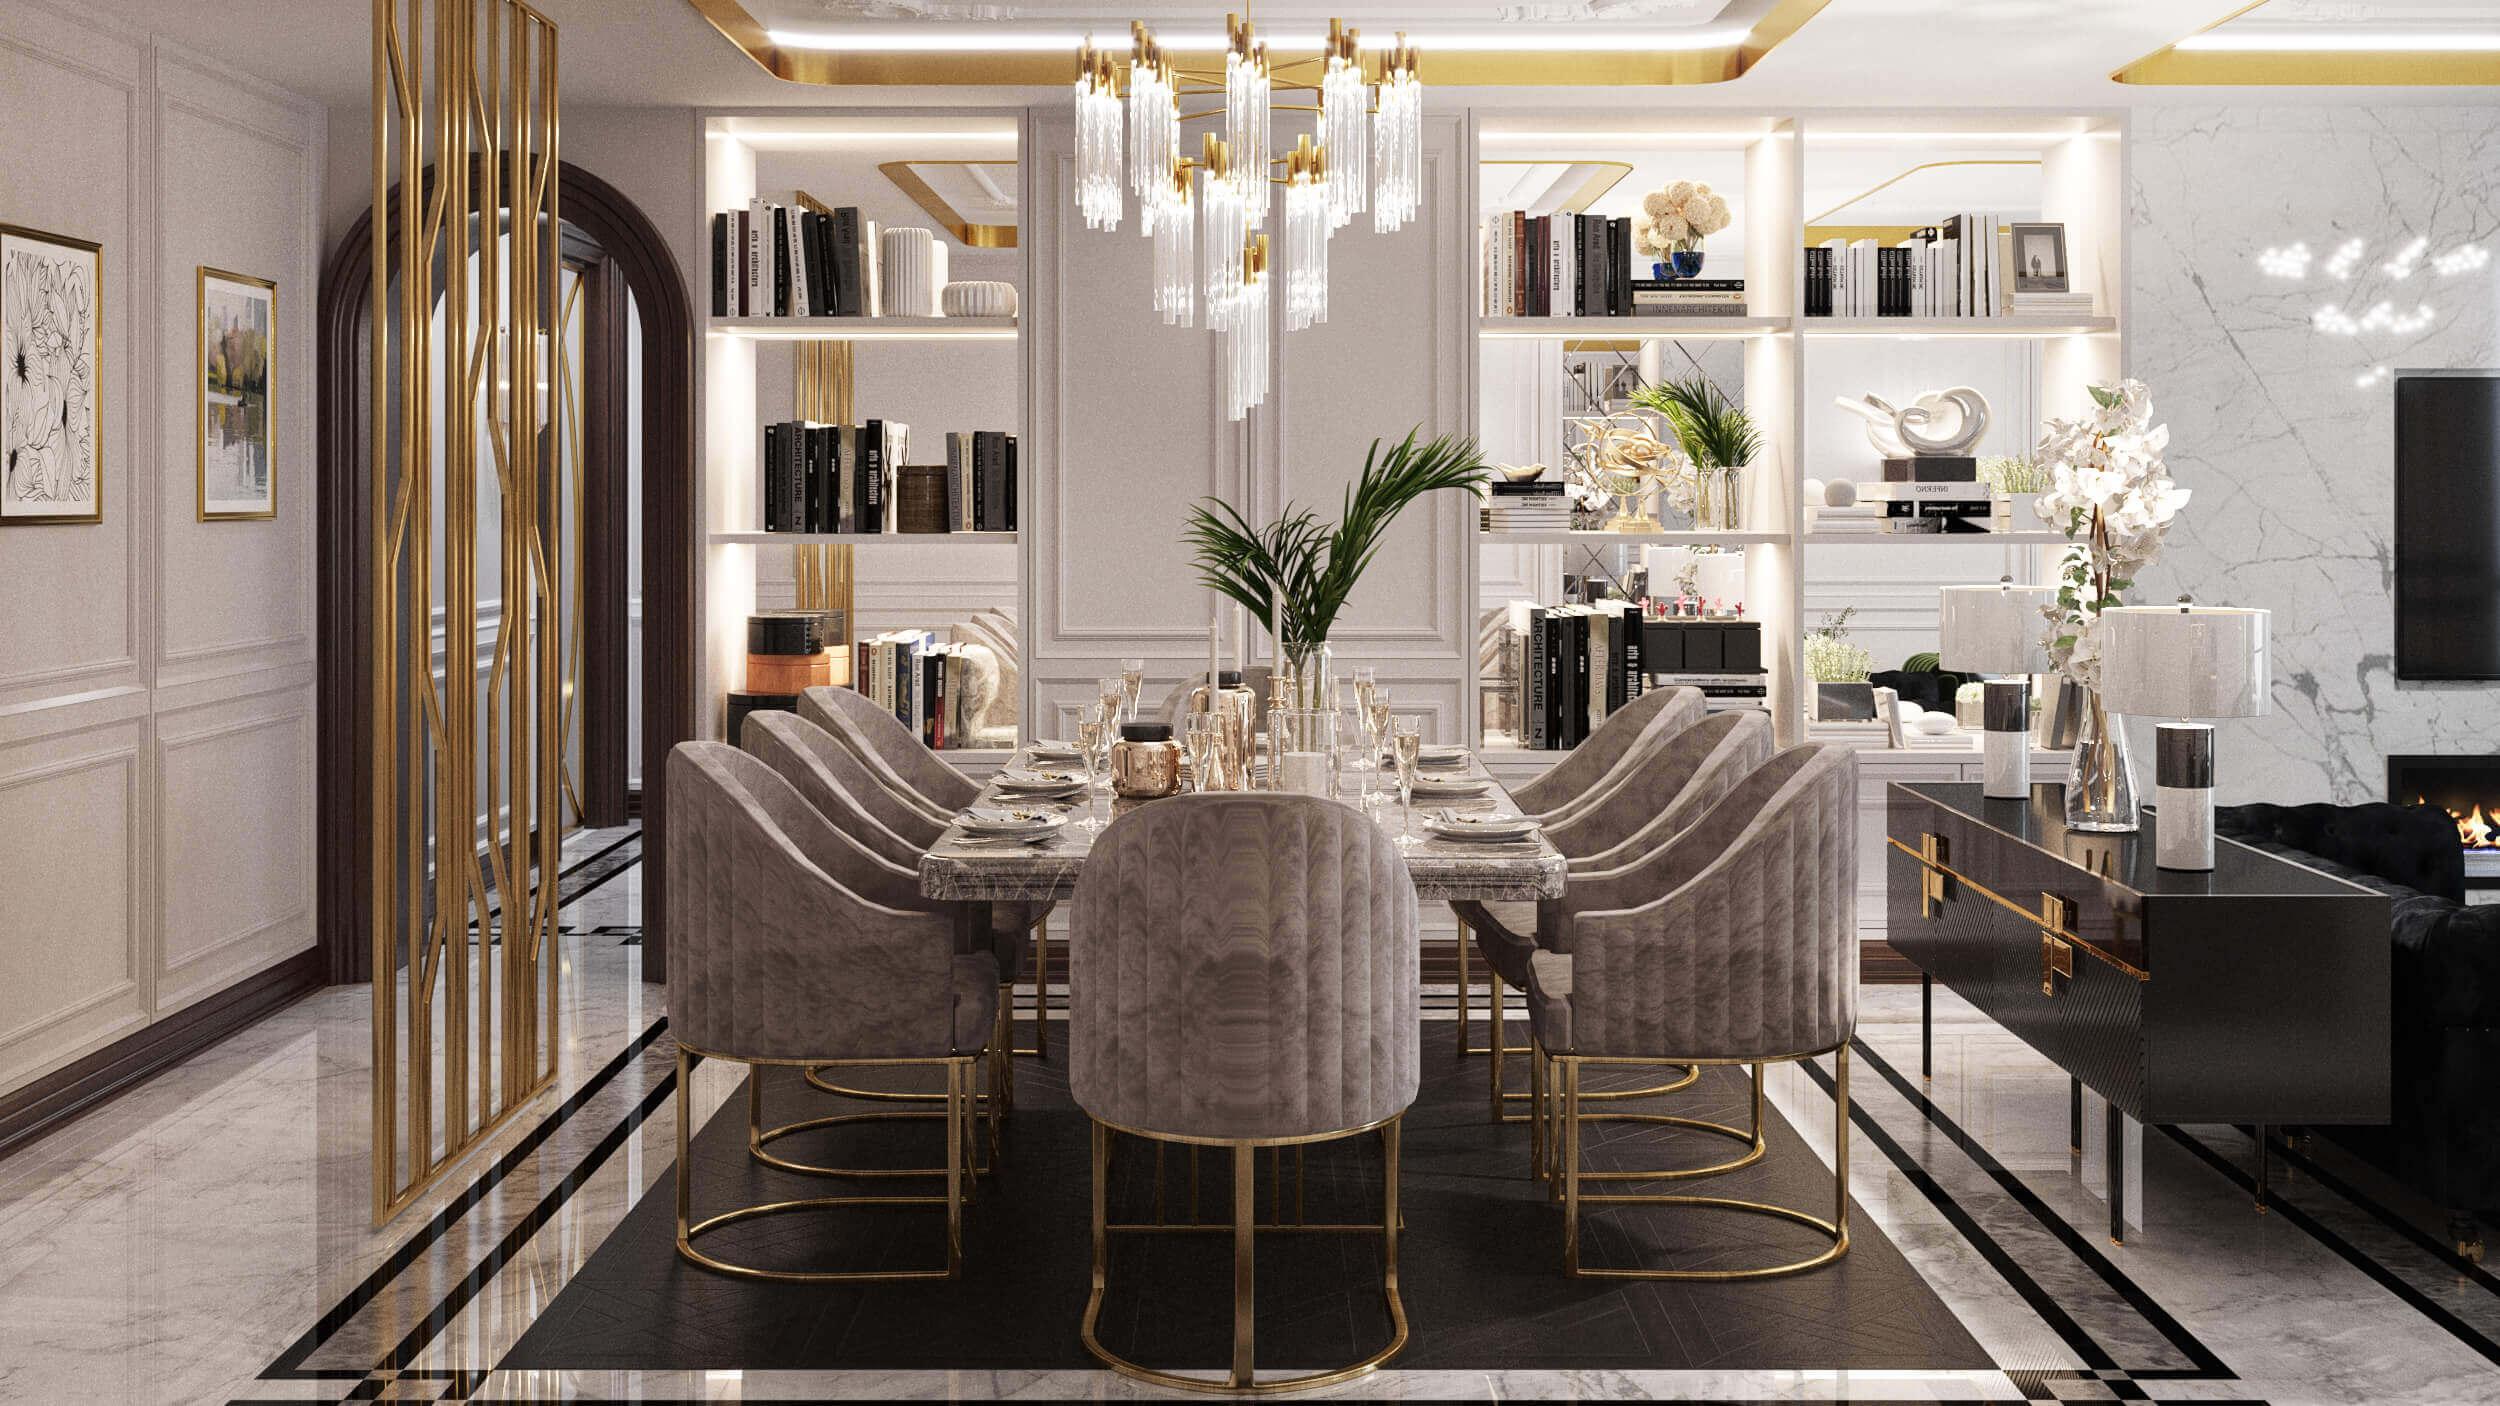 flat decoration 3860 IK Flat Residential